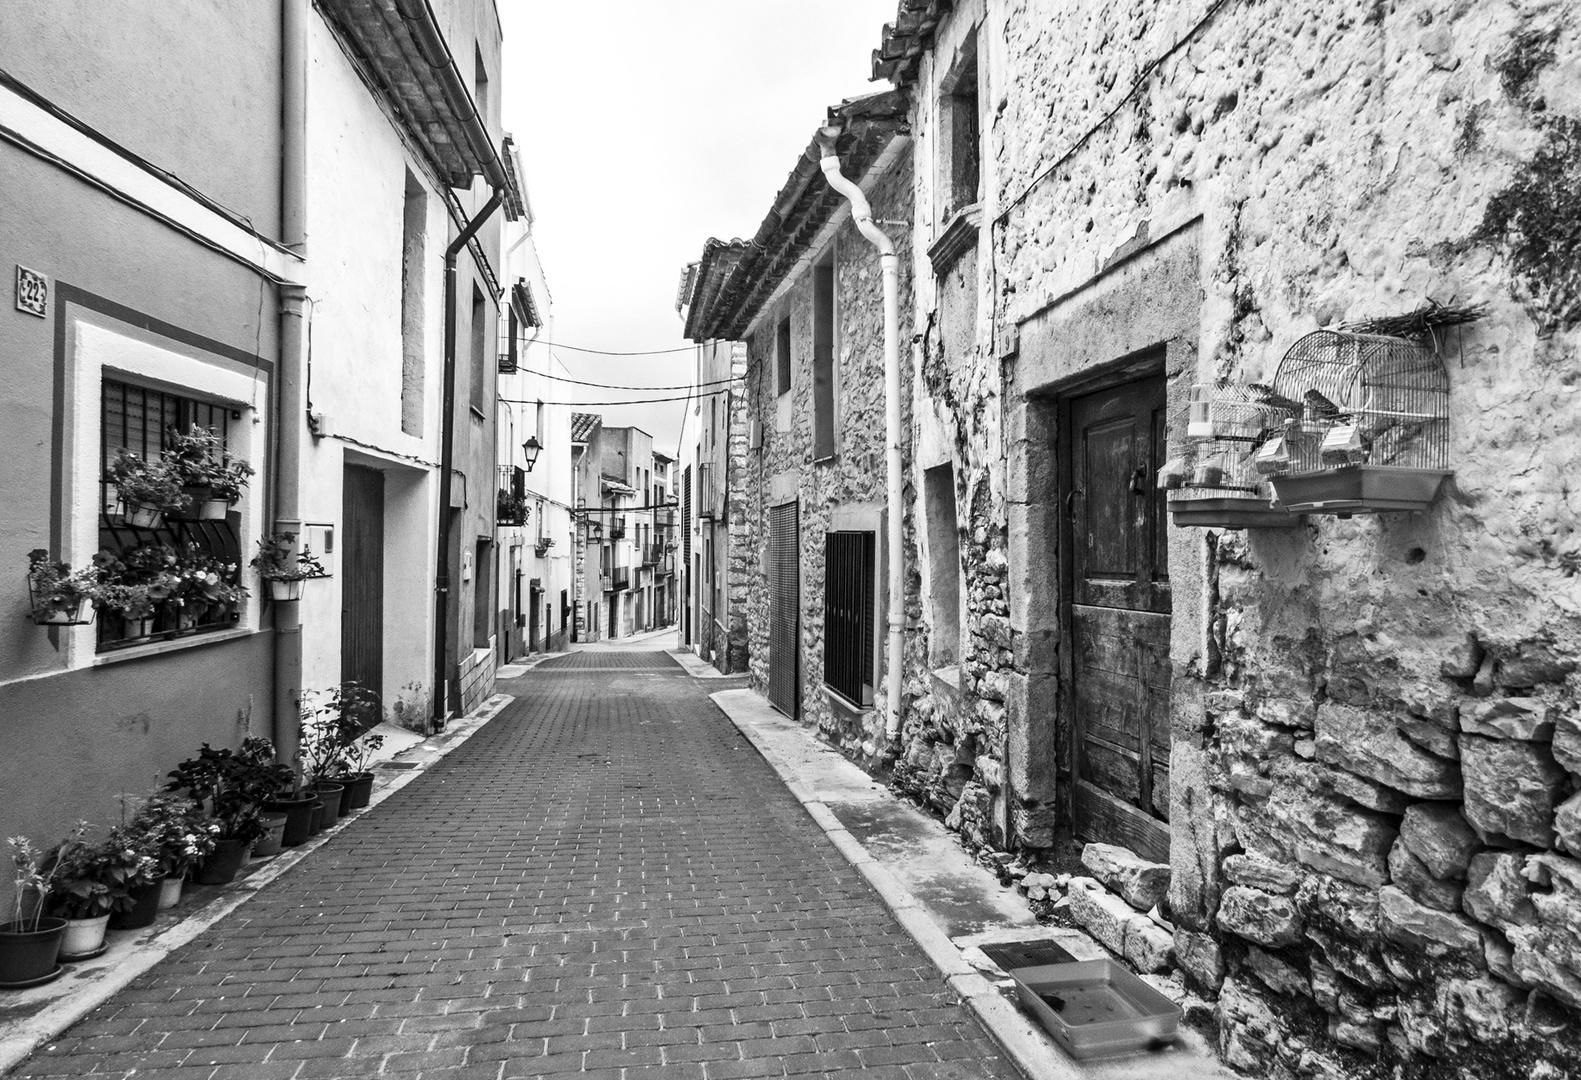 Quién vive ahi II (El  vecindario) - Who lives there II (The neighborhood)